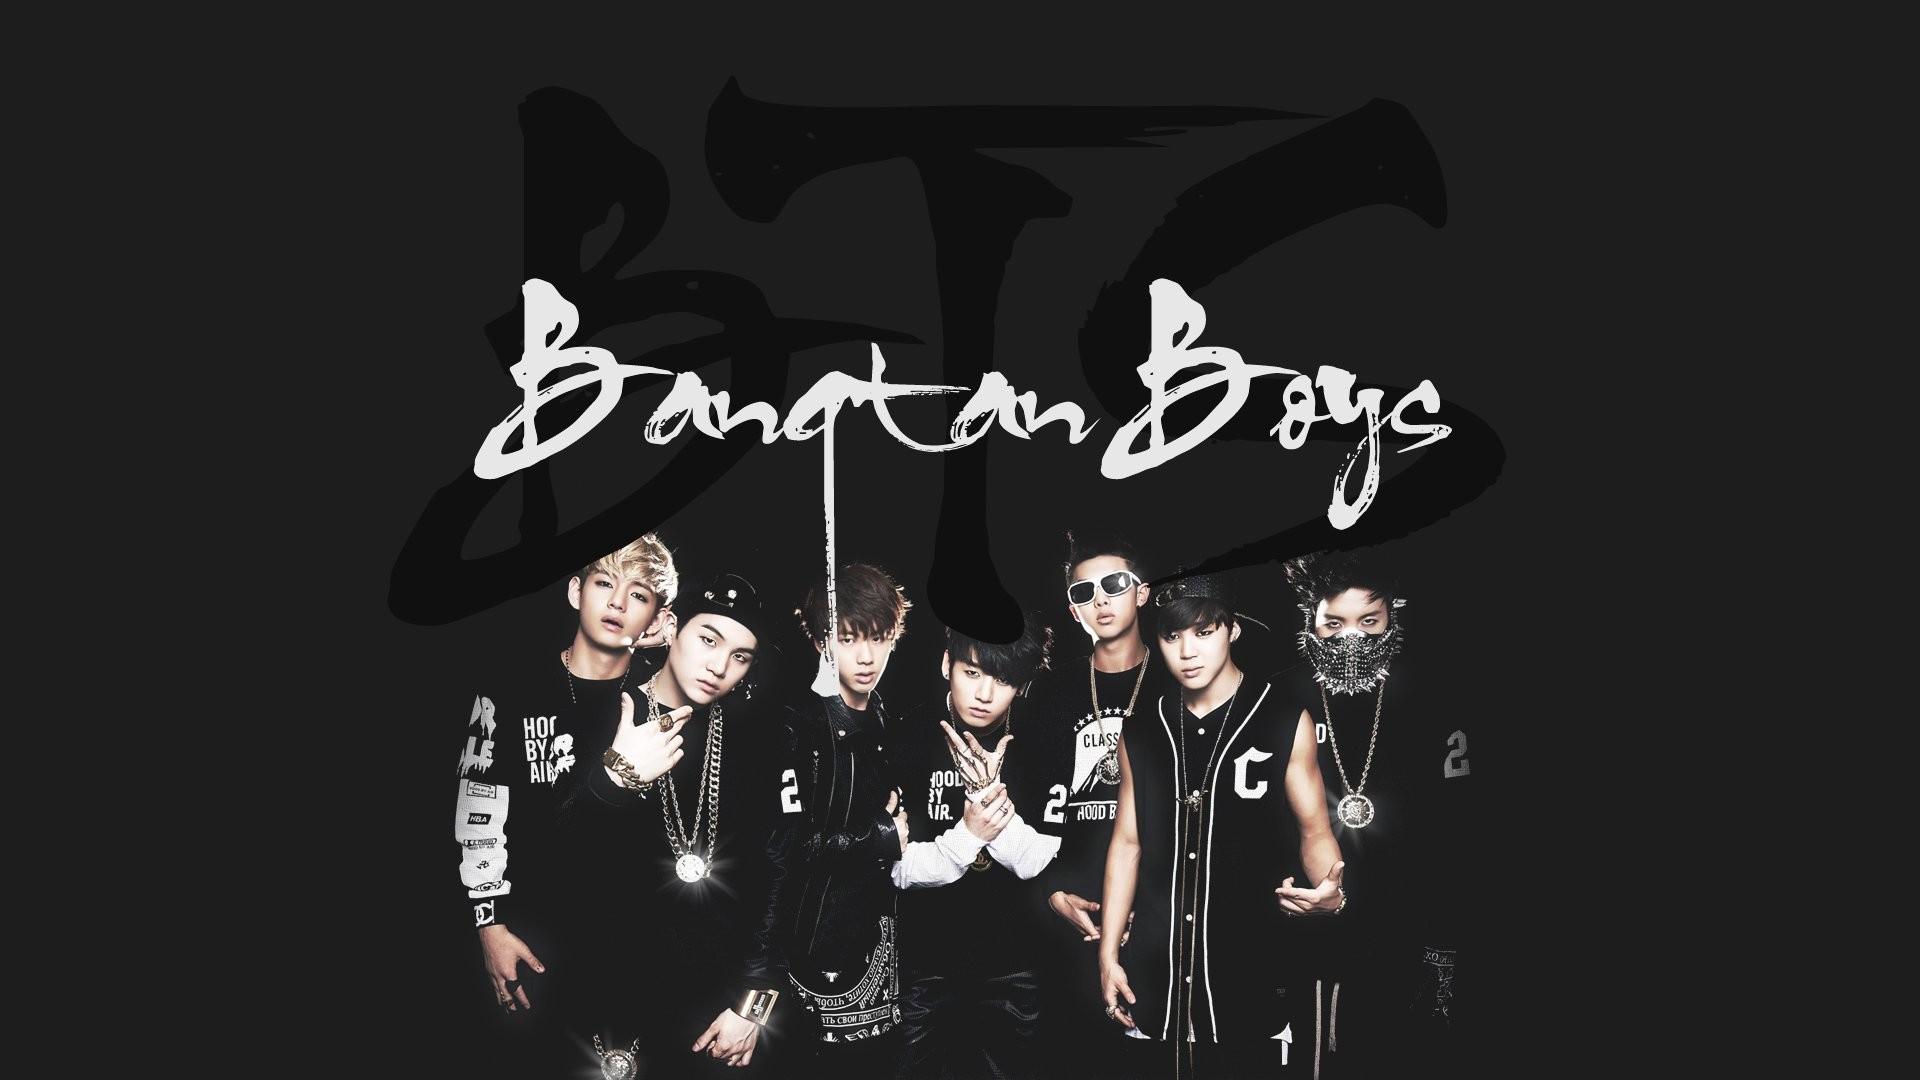 Bulletproof Boy Scouts bts kpop hip hop r-b dance wallpaper background .